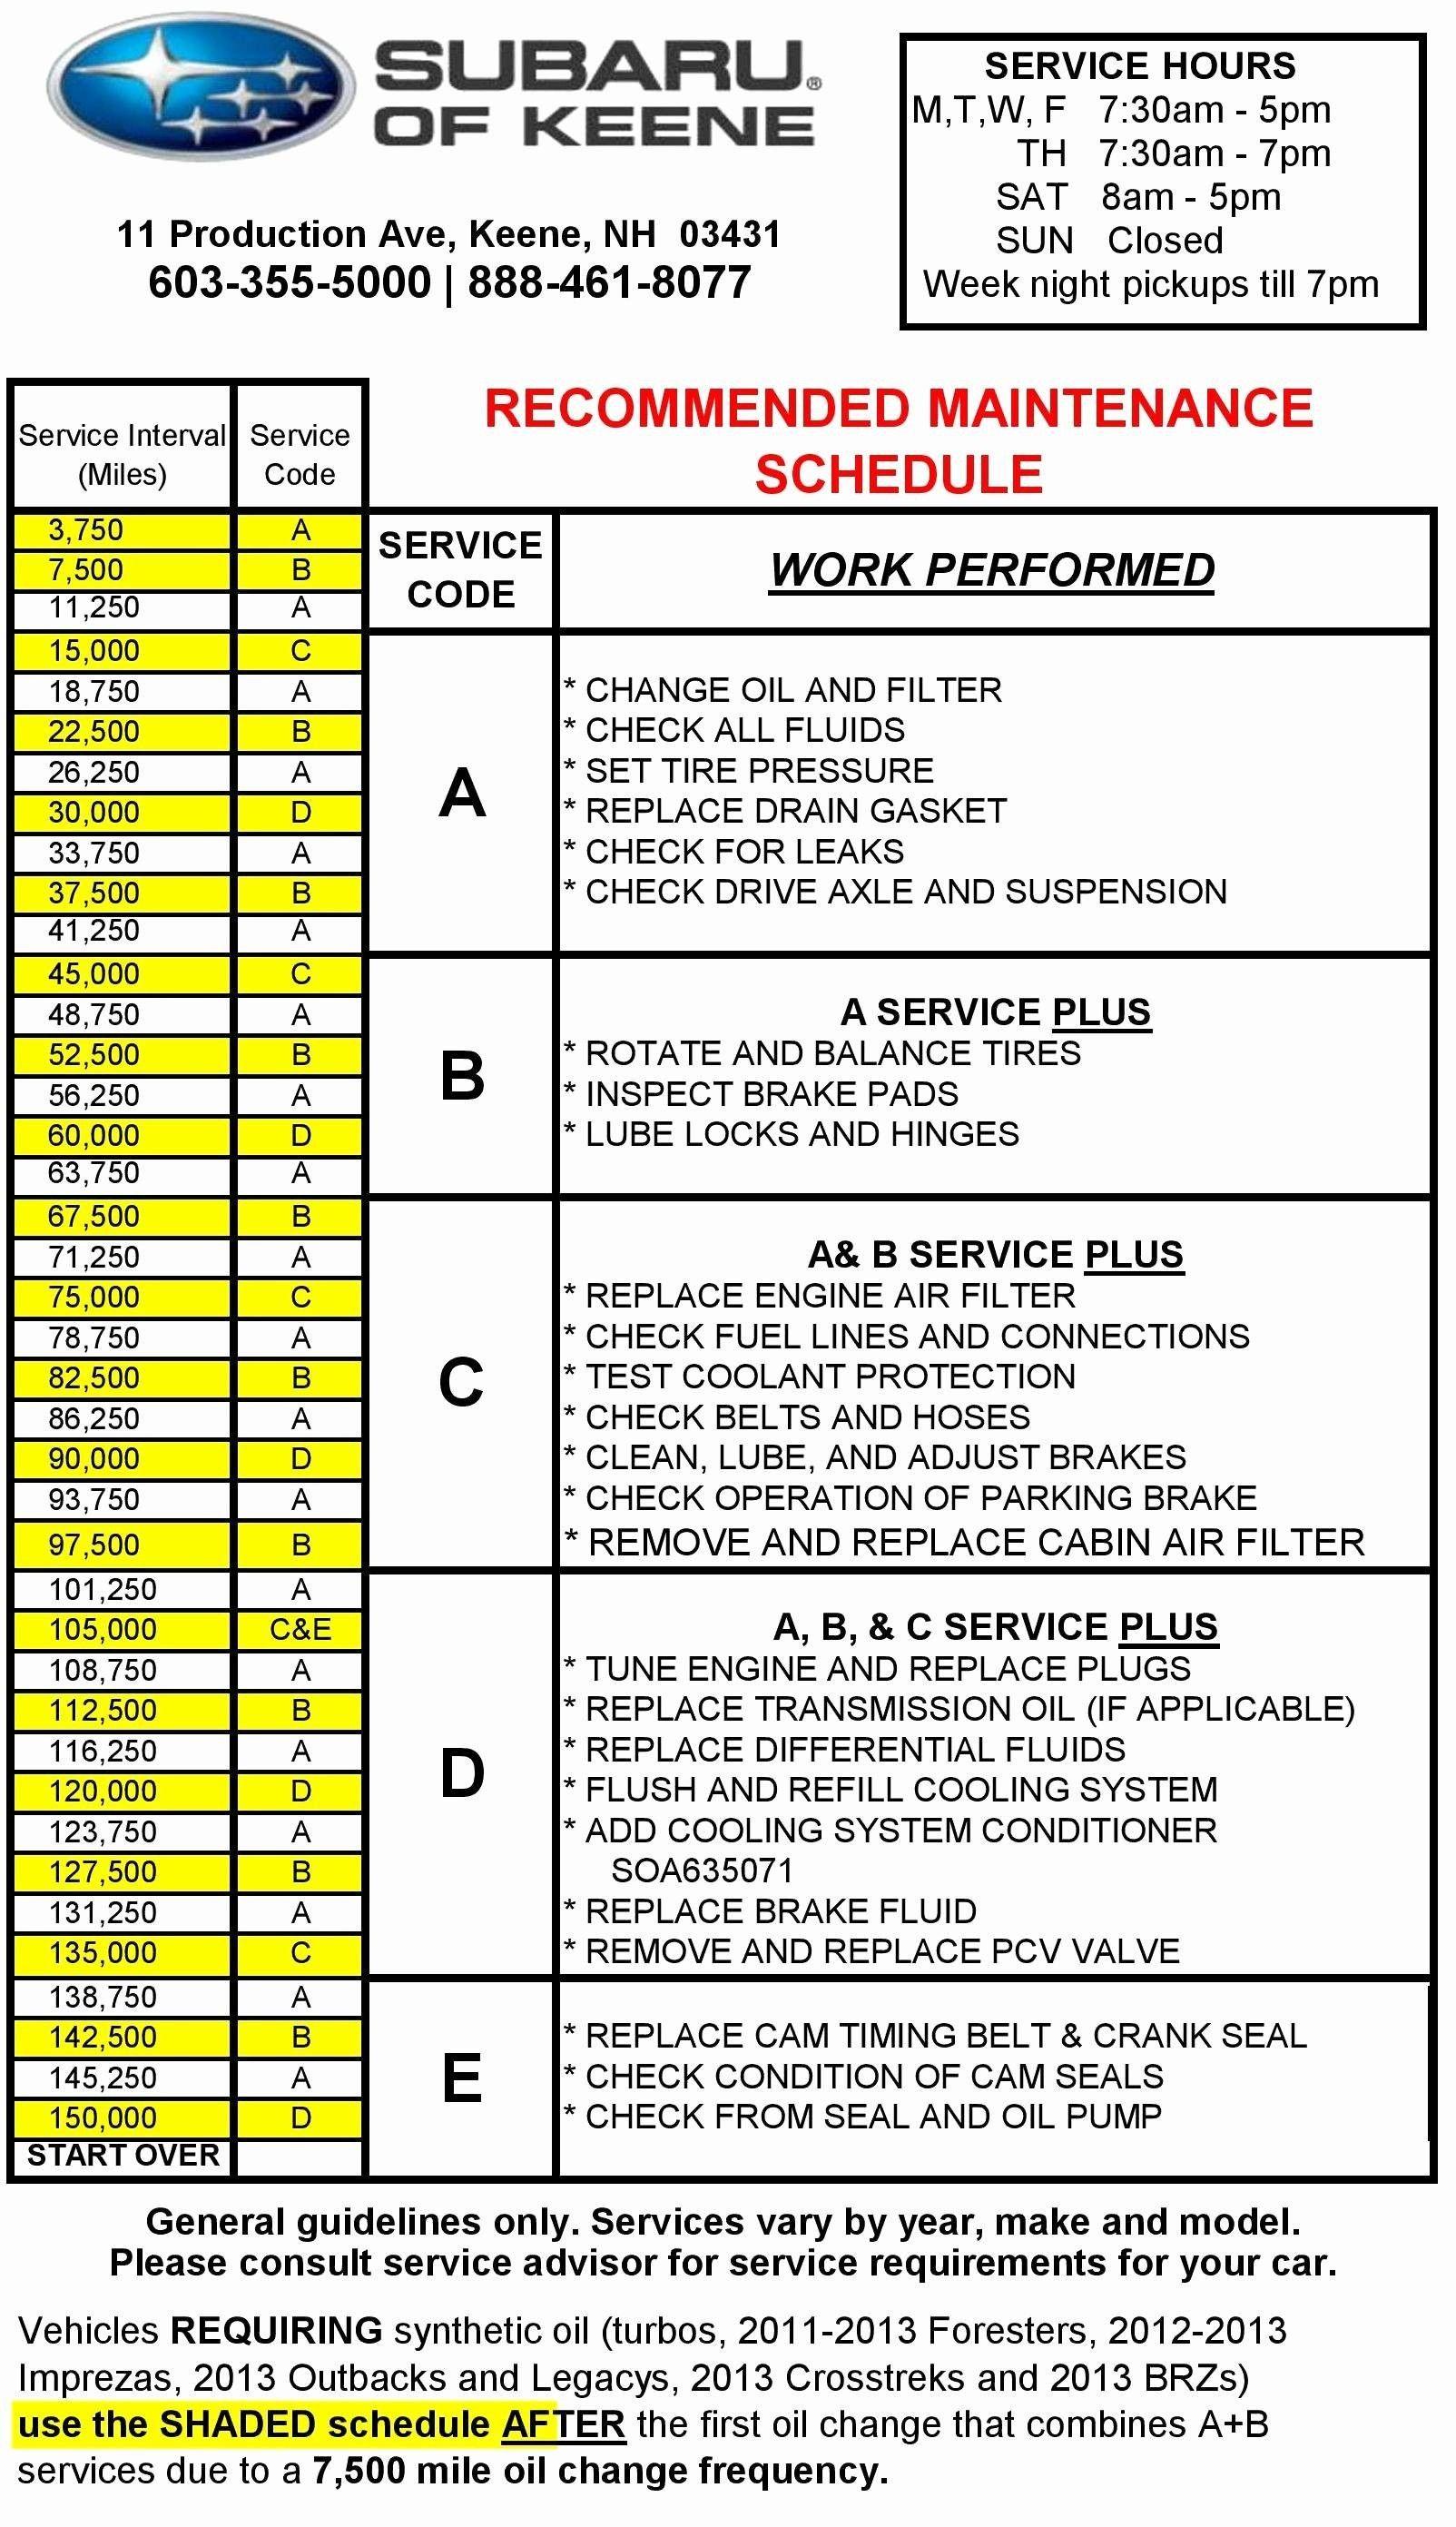 Microsoft Excel Timeline Template Microsoft Excel Timeline Template Microsoft Excel Timeline Tem Practices Worksheets Worksheet Template Budgeting Worksheets